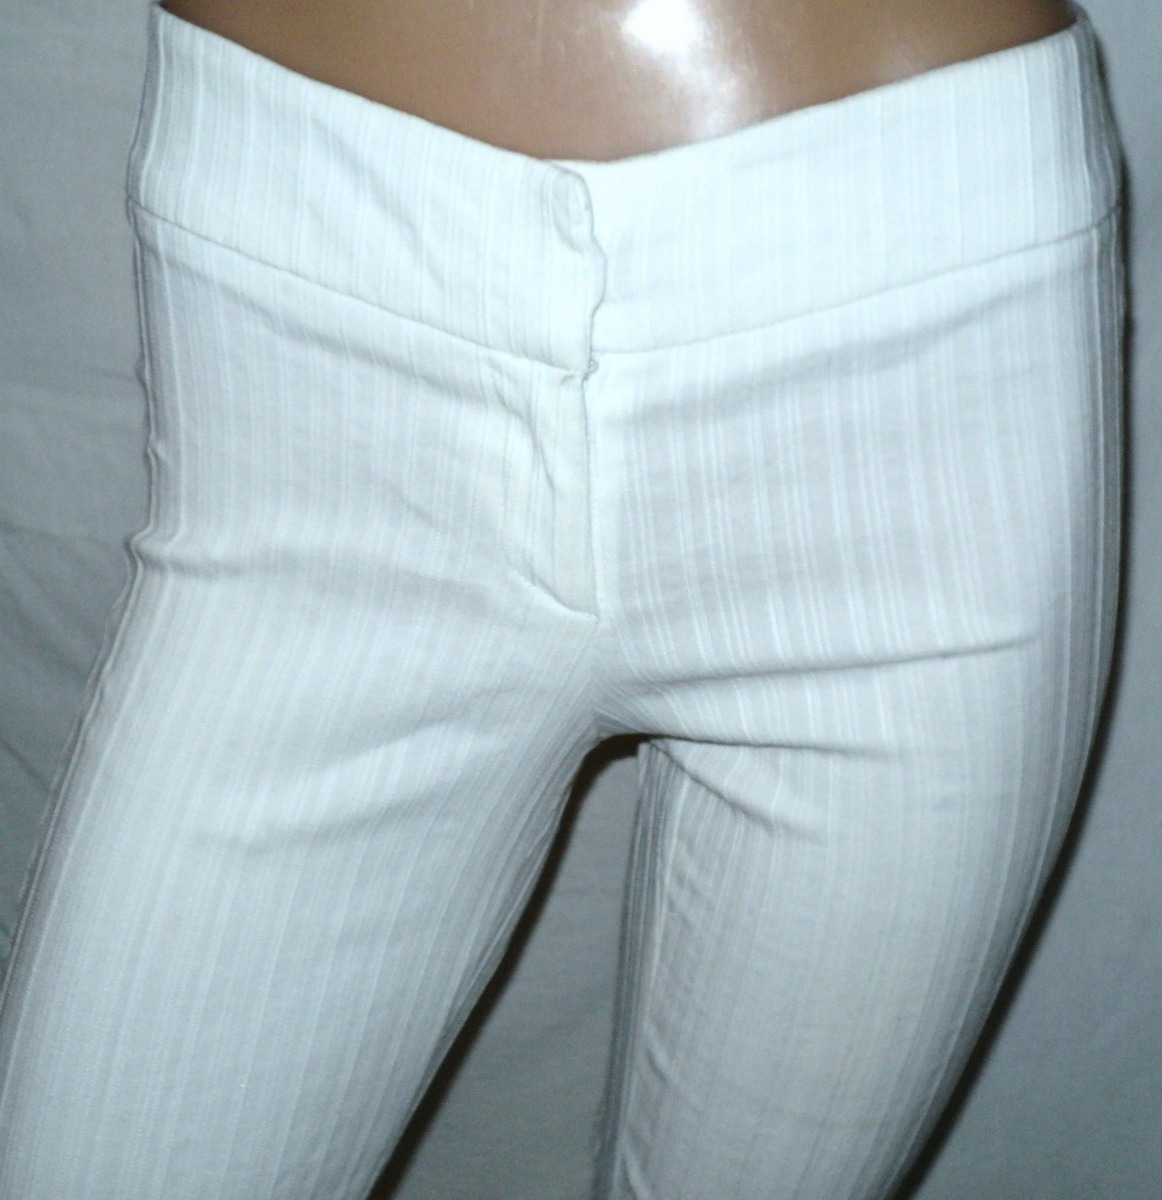 Eeuu230 Elastizado De Pantalon Mujer 00 M Blanco Oxford Talla xshtQdrC